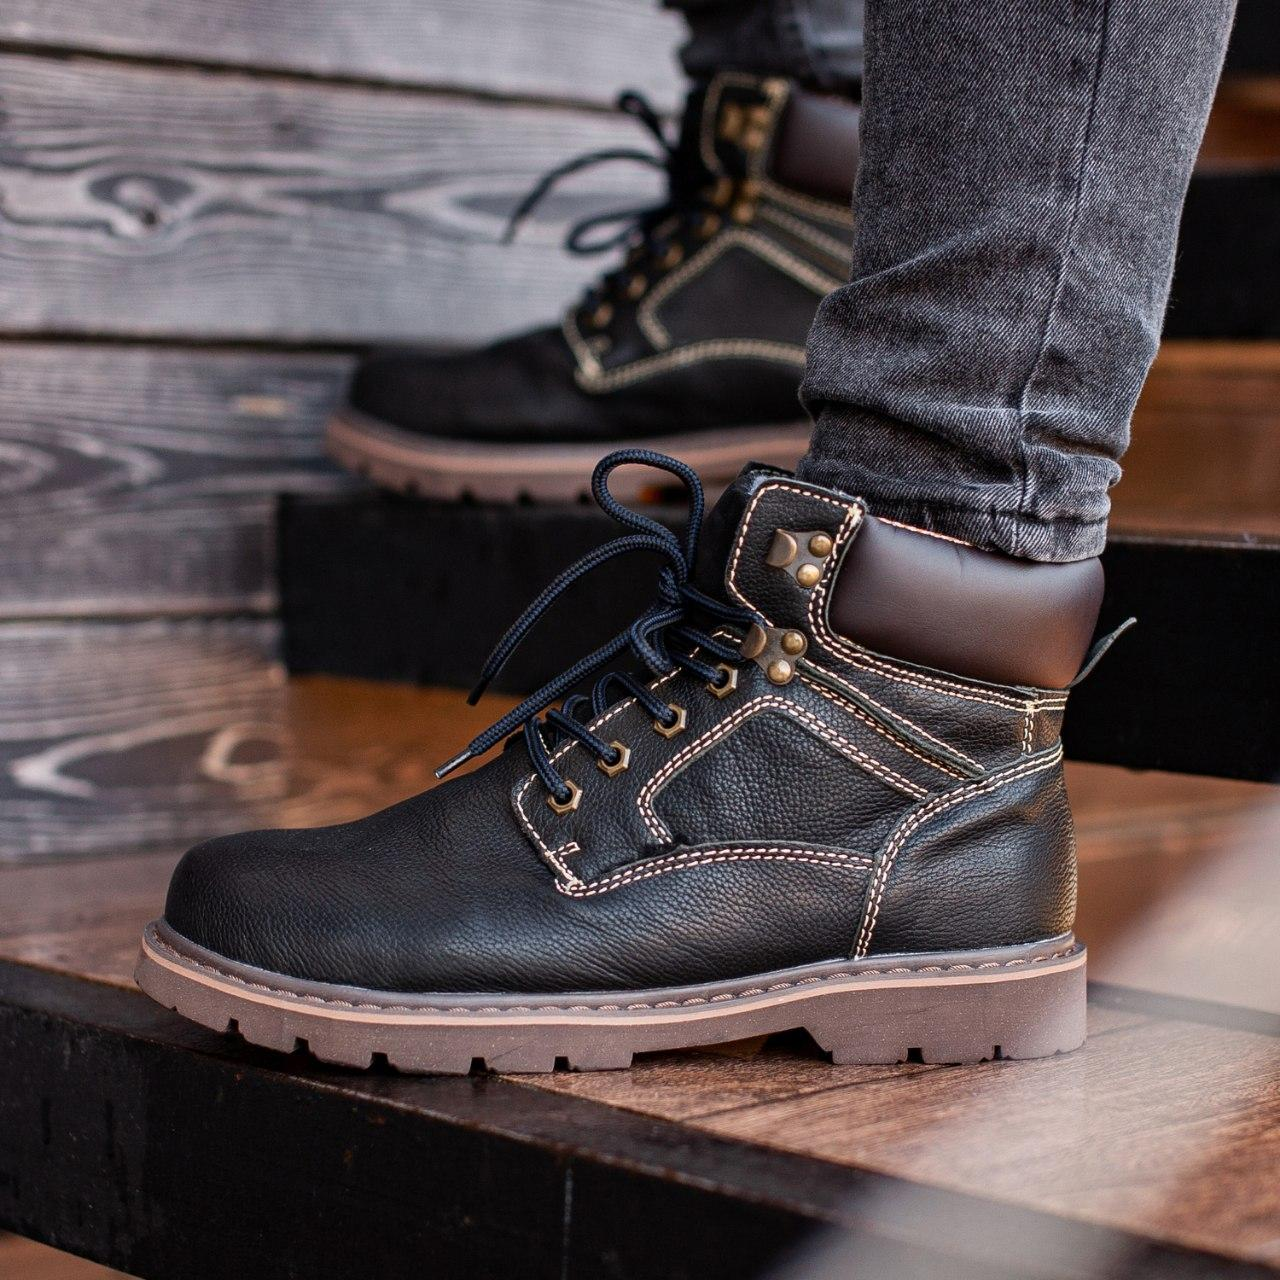 Ботинки South Graft black - фото 1